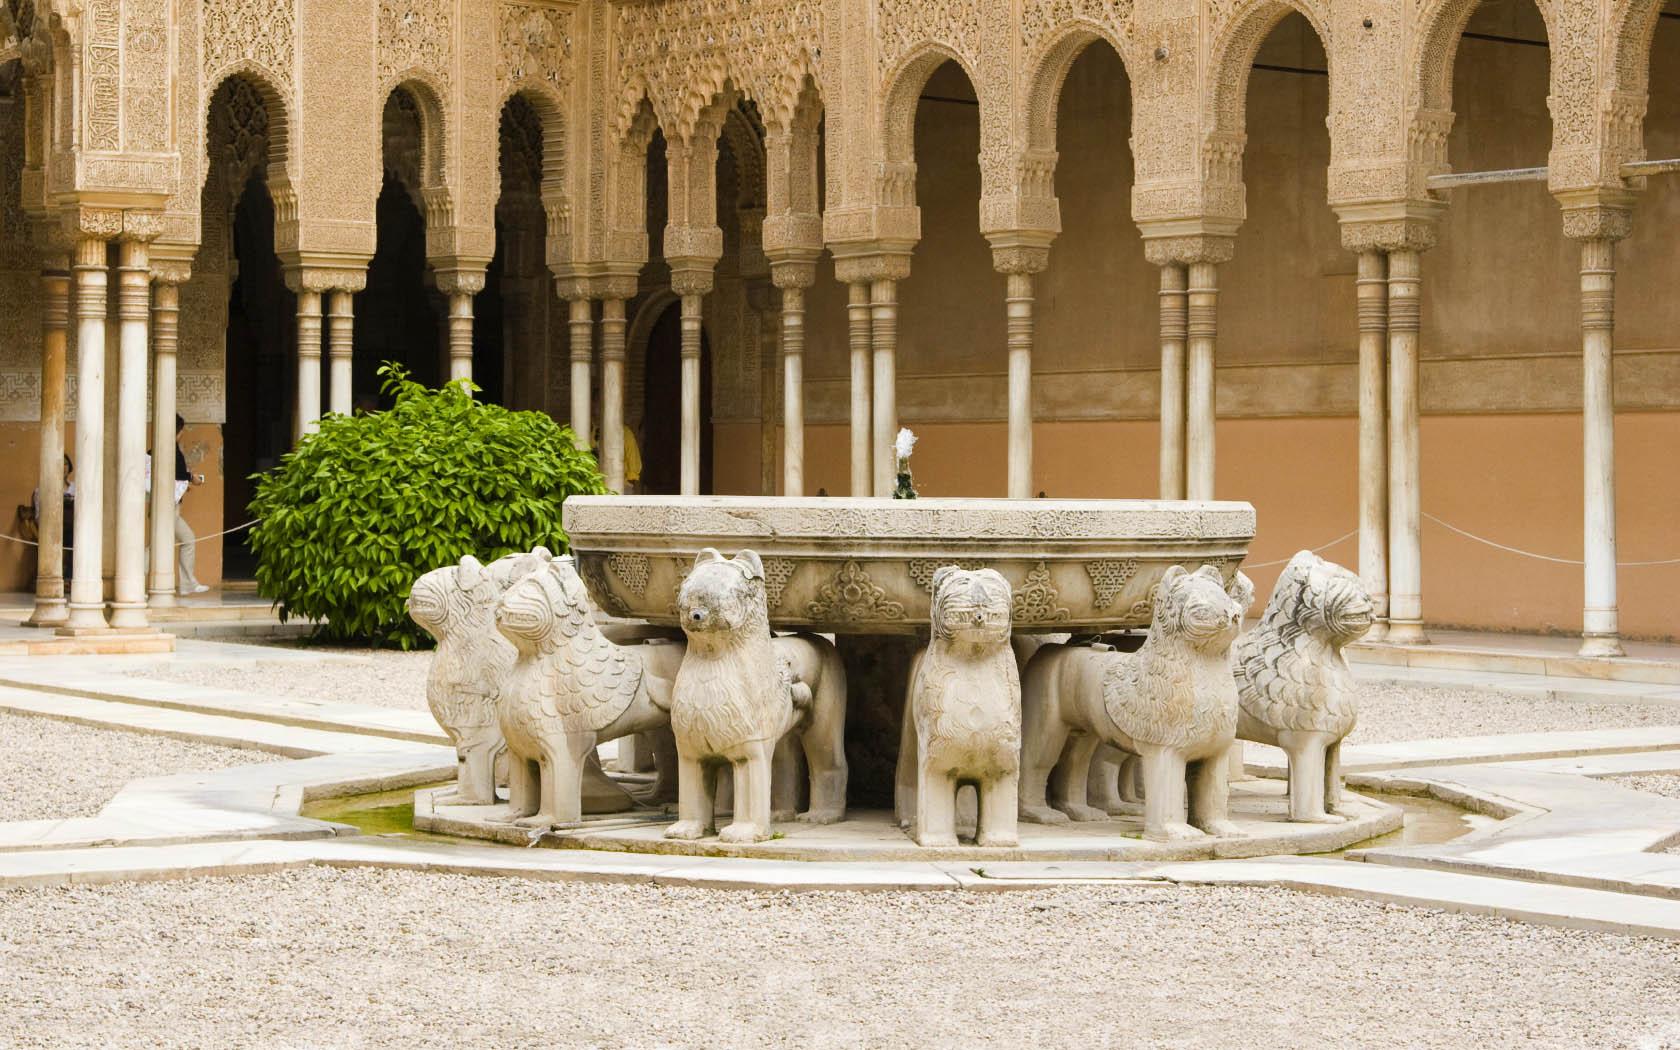 I Conferencia-Coloquio de Granada